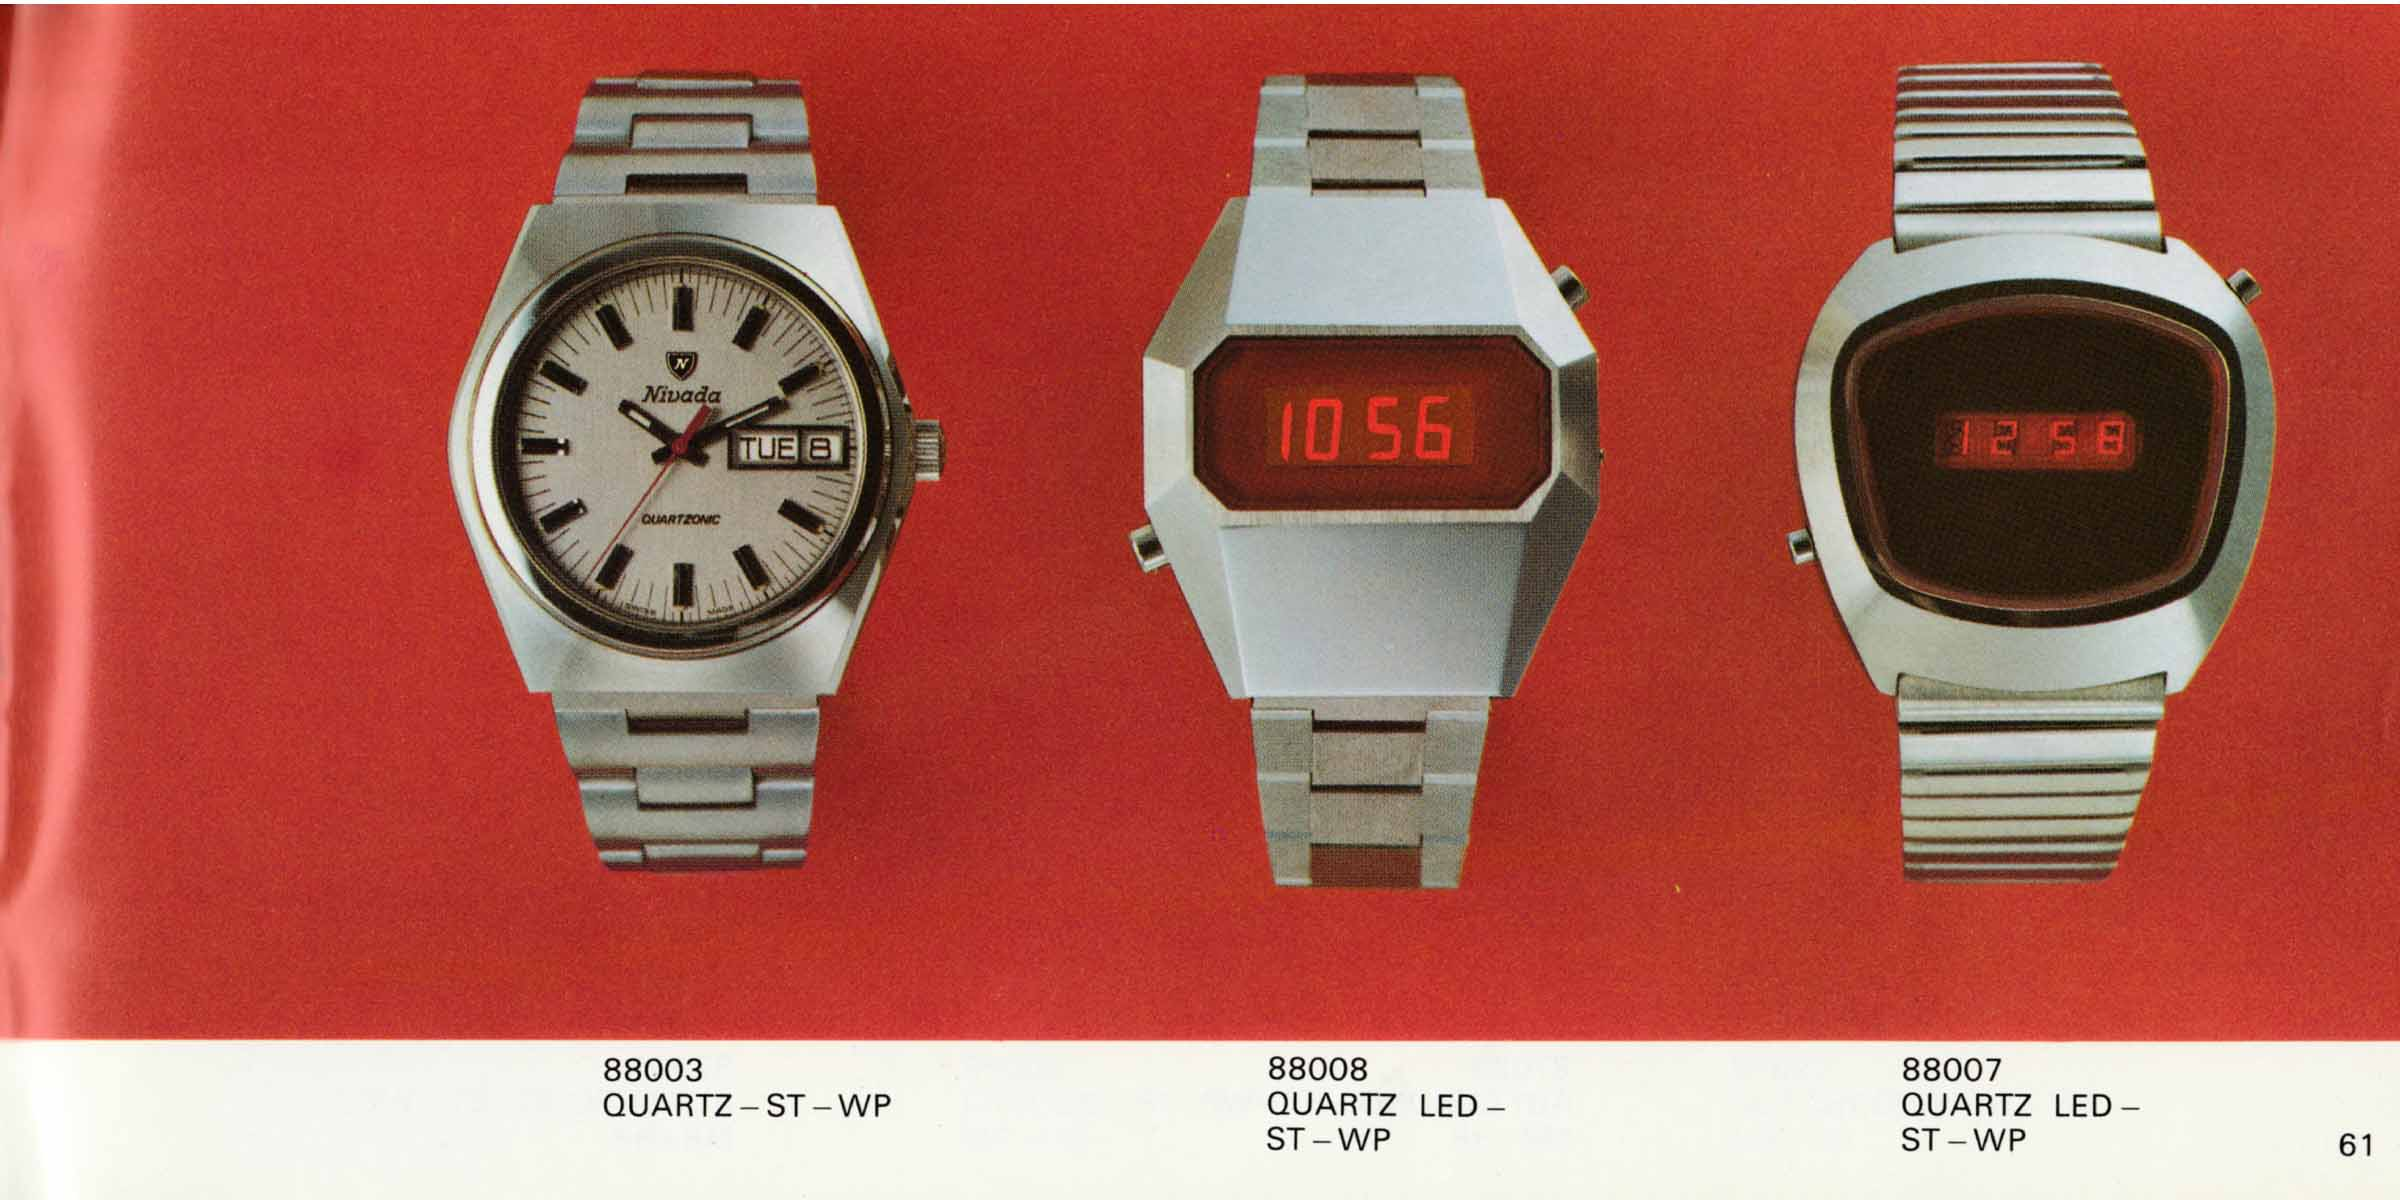 Nivada 1977 p61.jpg